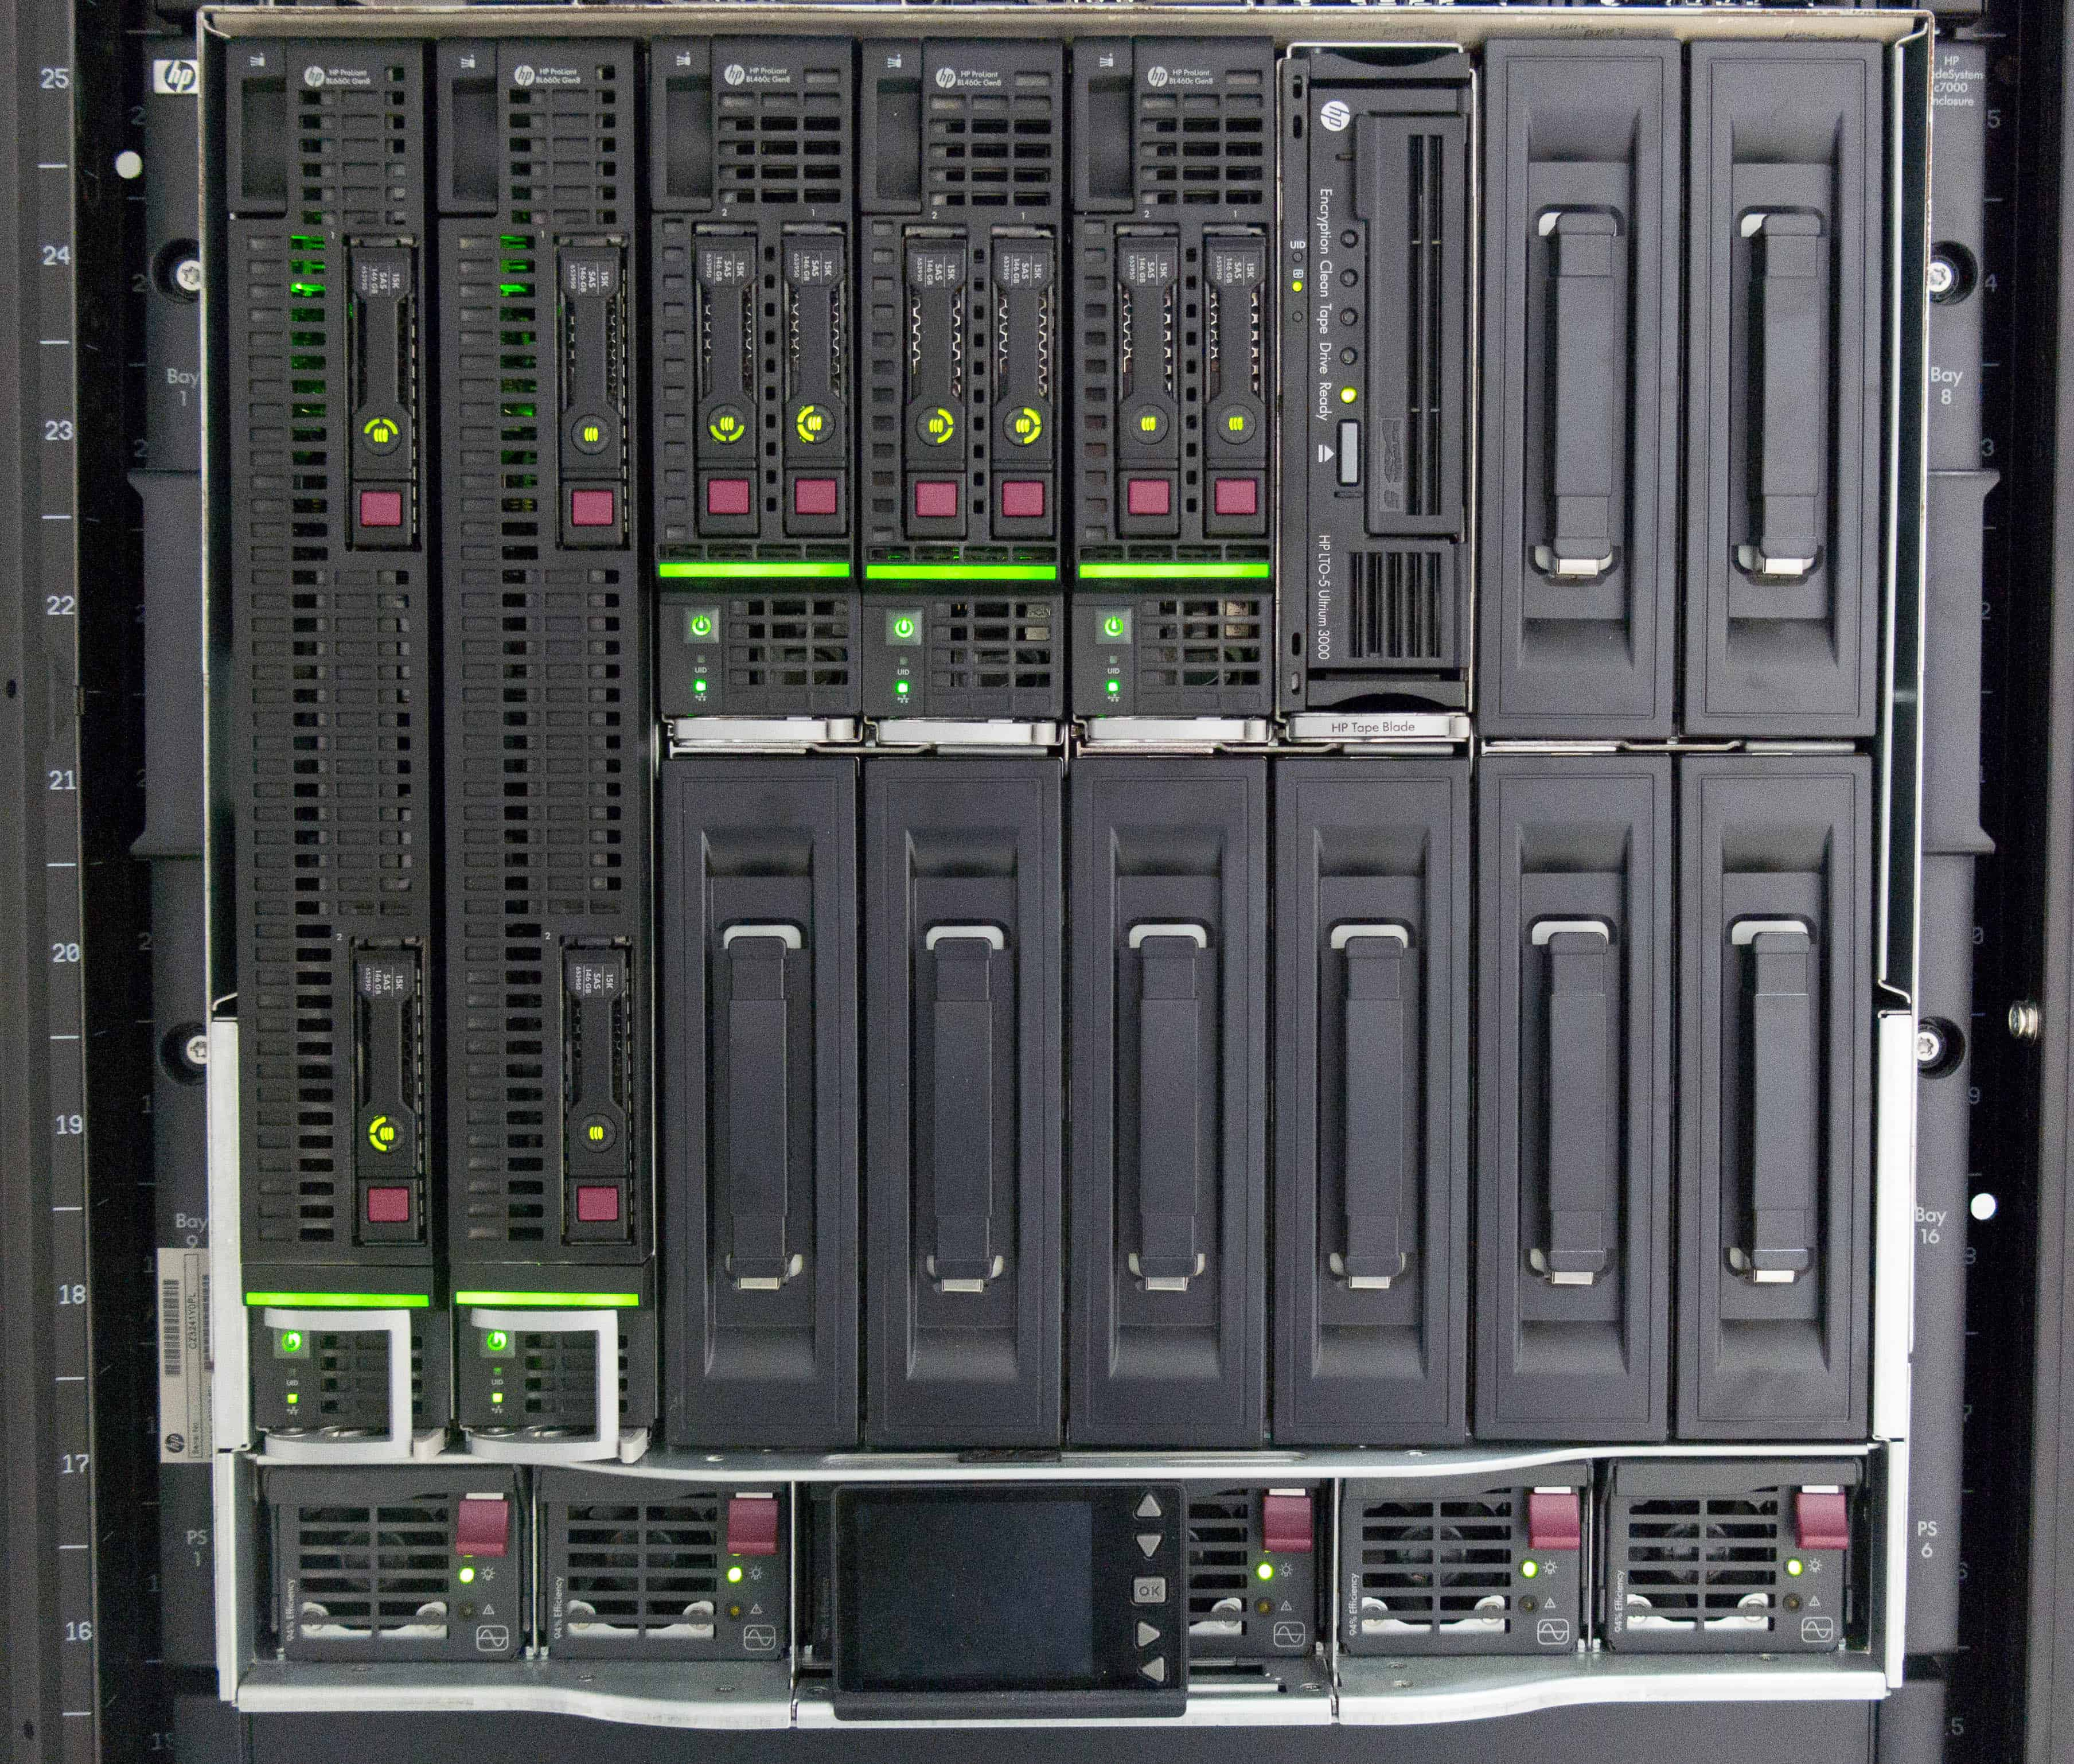 Linux HP Smart Array Raid Controller | SumGuy's Ramblings